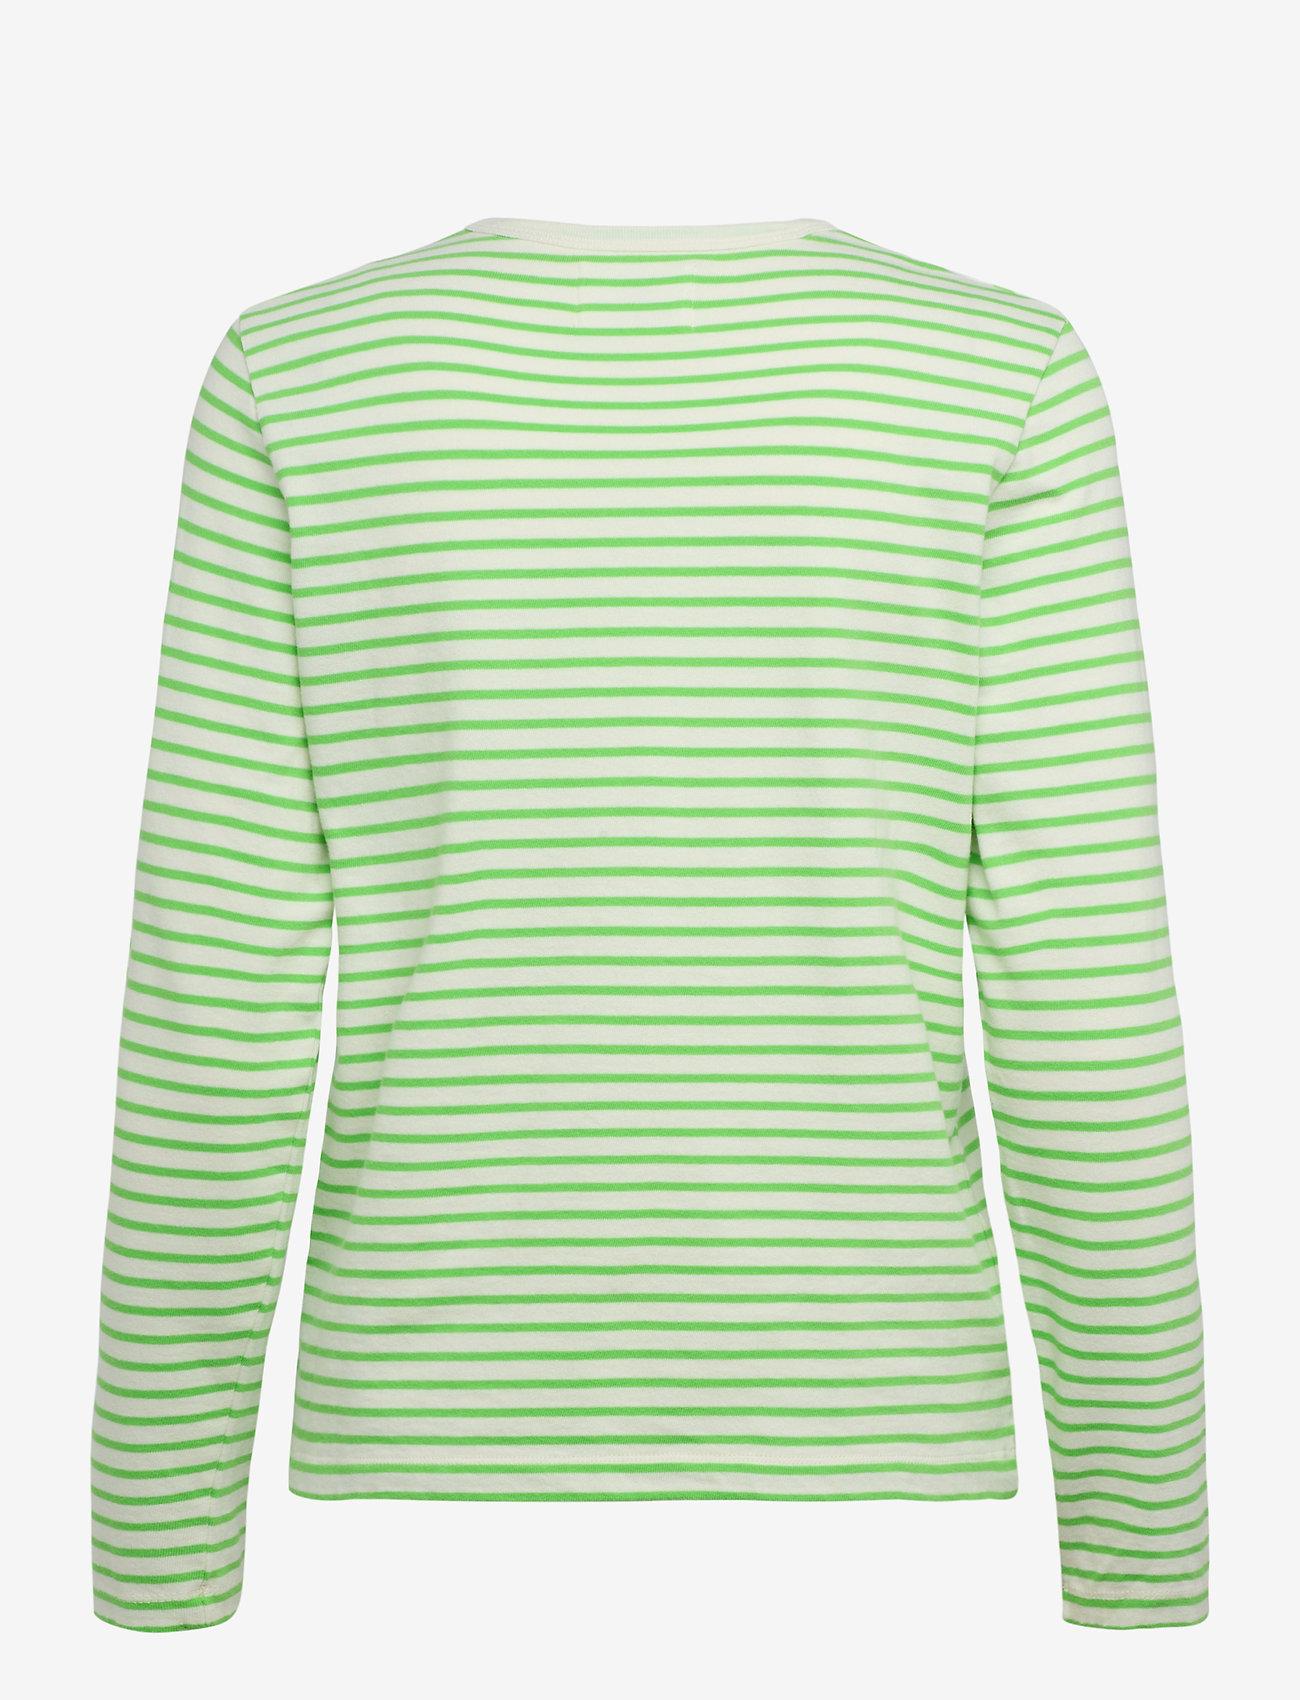 Wood Wood - Moa stripe long sleeve - langærmede toppe - off-white/green stripes - 1